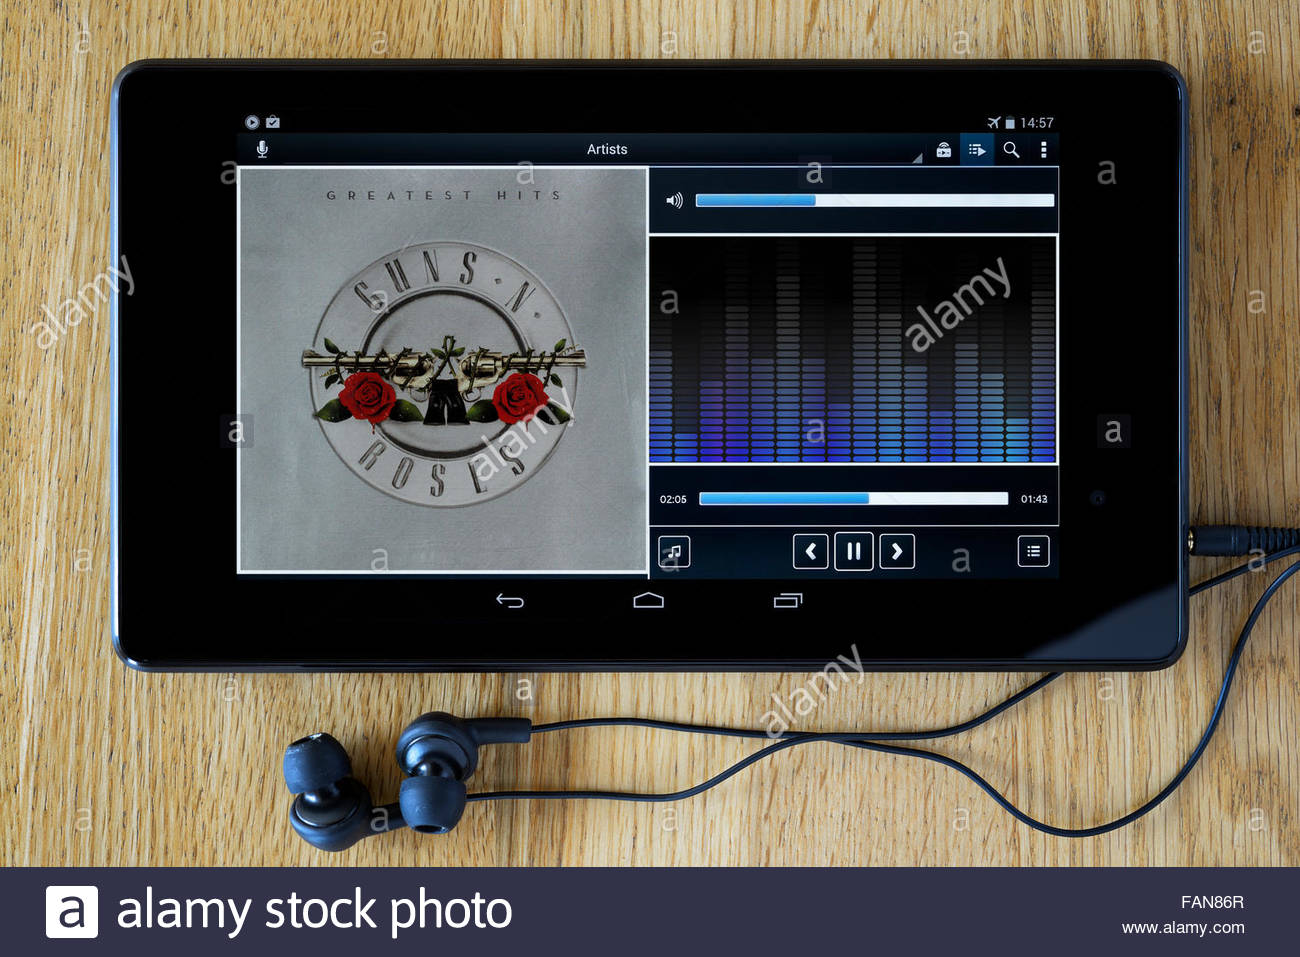 Guns N Roses greatest hits album, MP3 album art on PC tablet